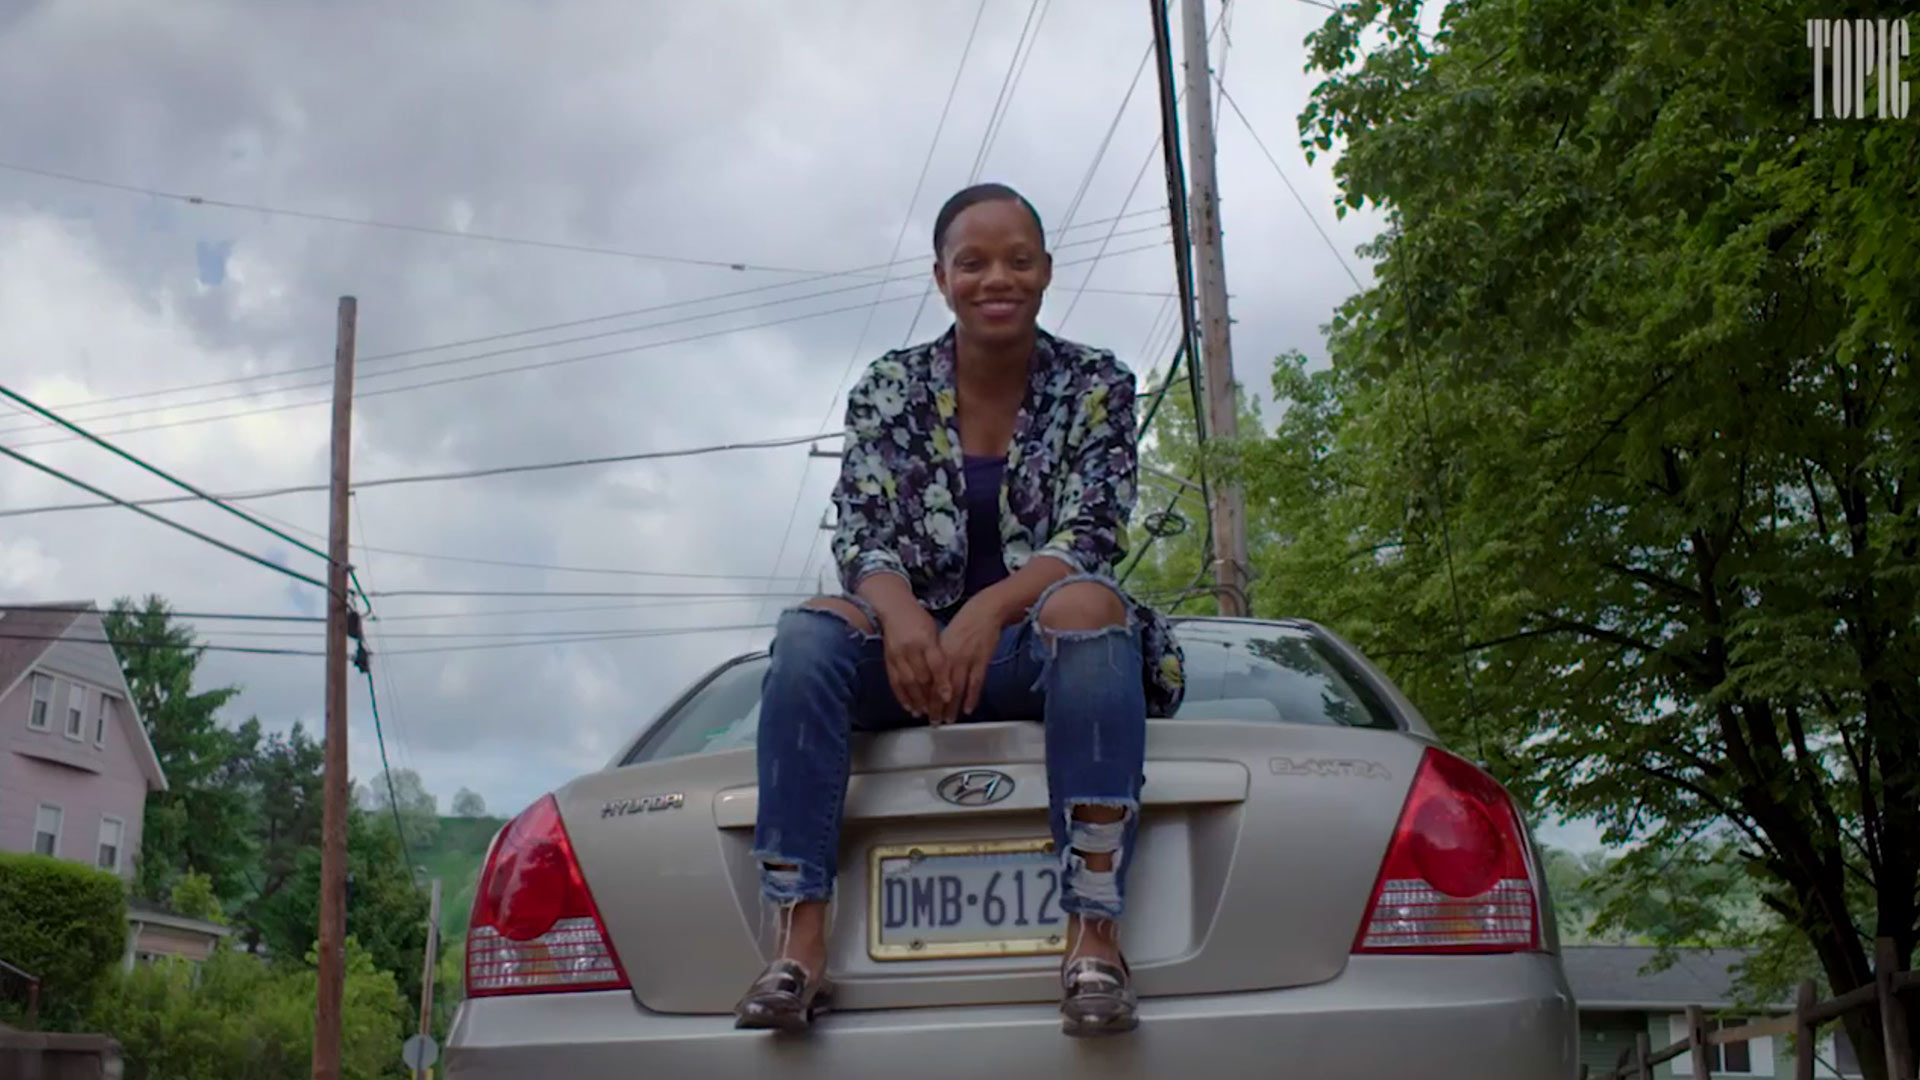 OneTwentyNineFilms_News_Rosie_Haber_Braddock_PA_The_New_Yorker.jpg